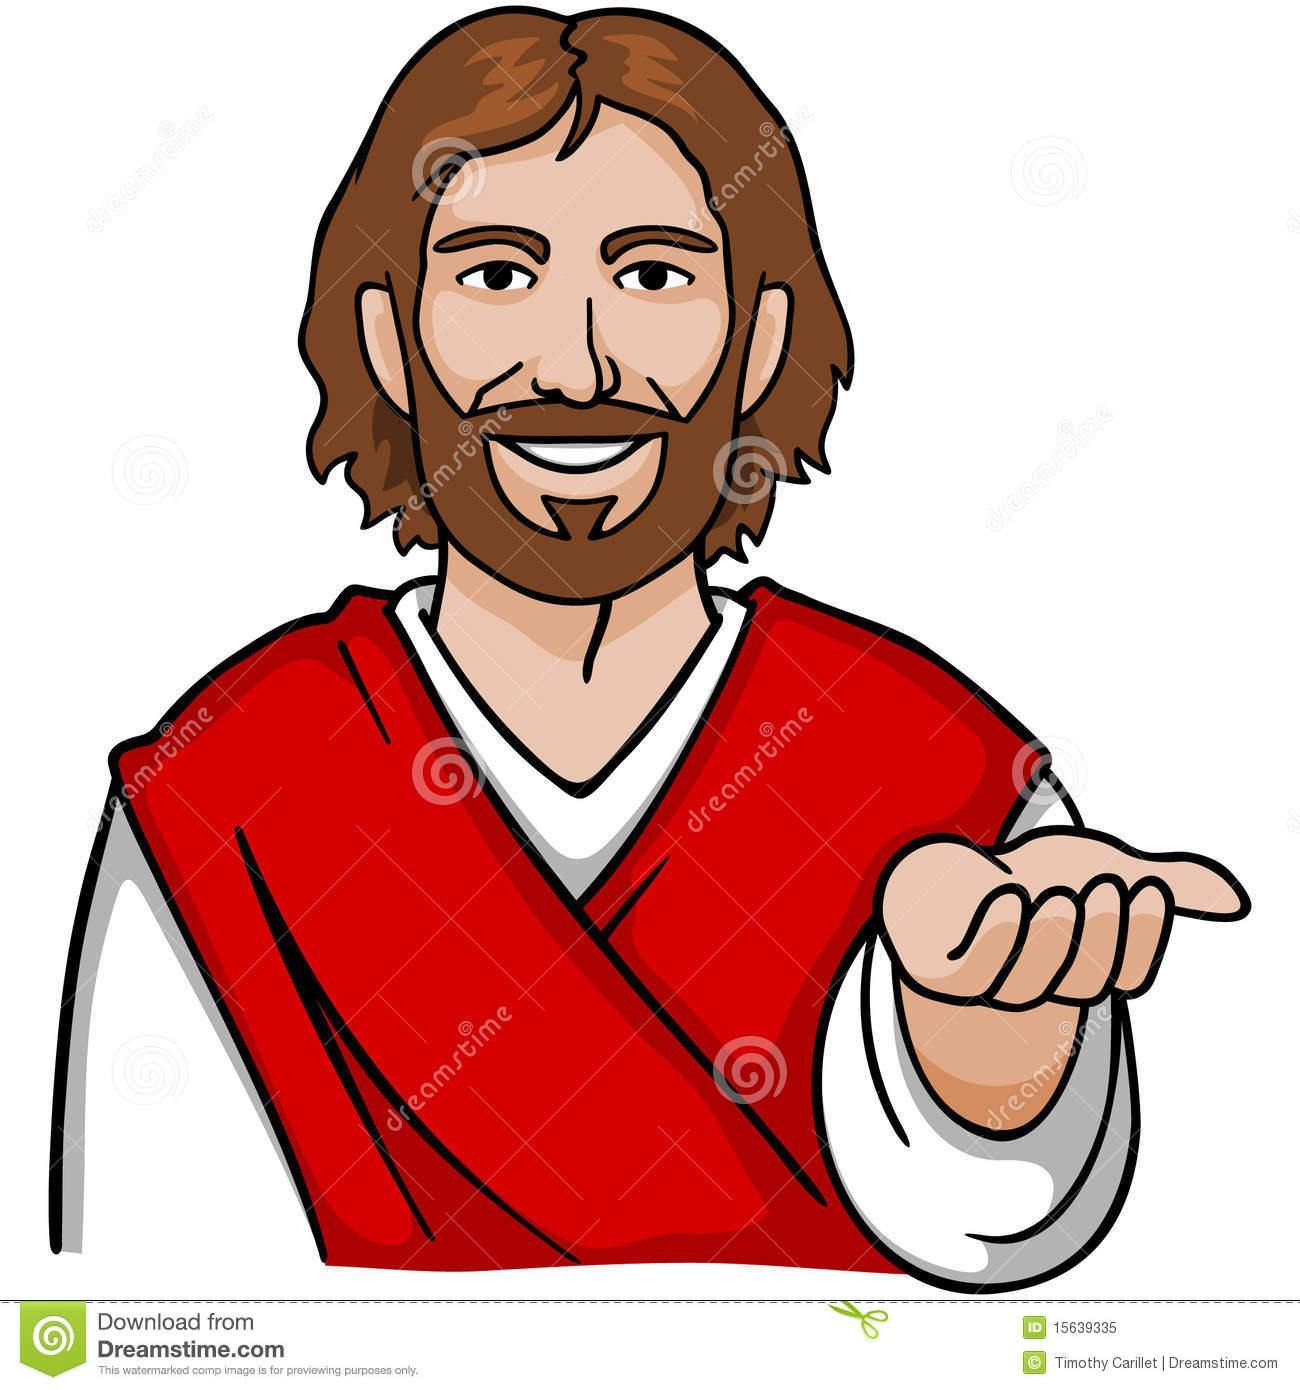 Jesus Clip Art. Resolution 1300x1390 .-Jesus Clip Art. Resolution 1300x1390 .-13